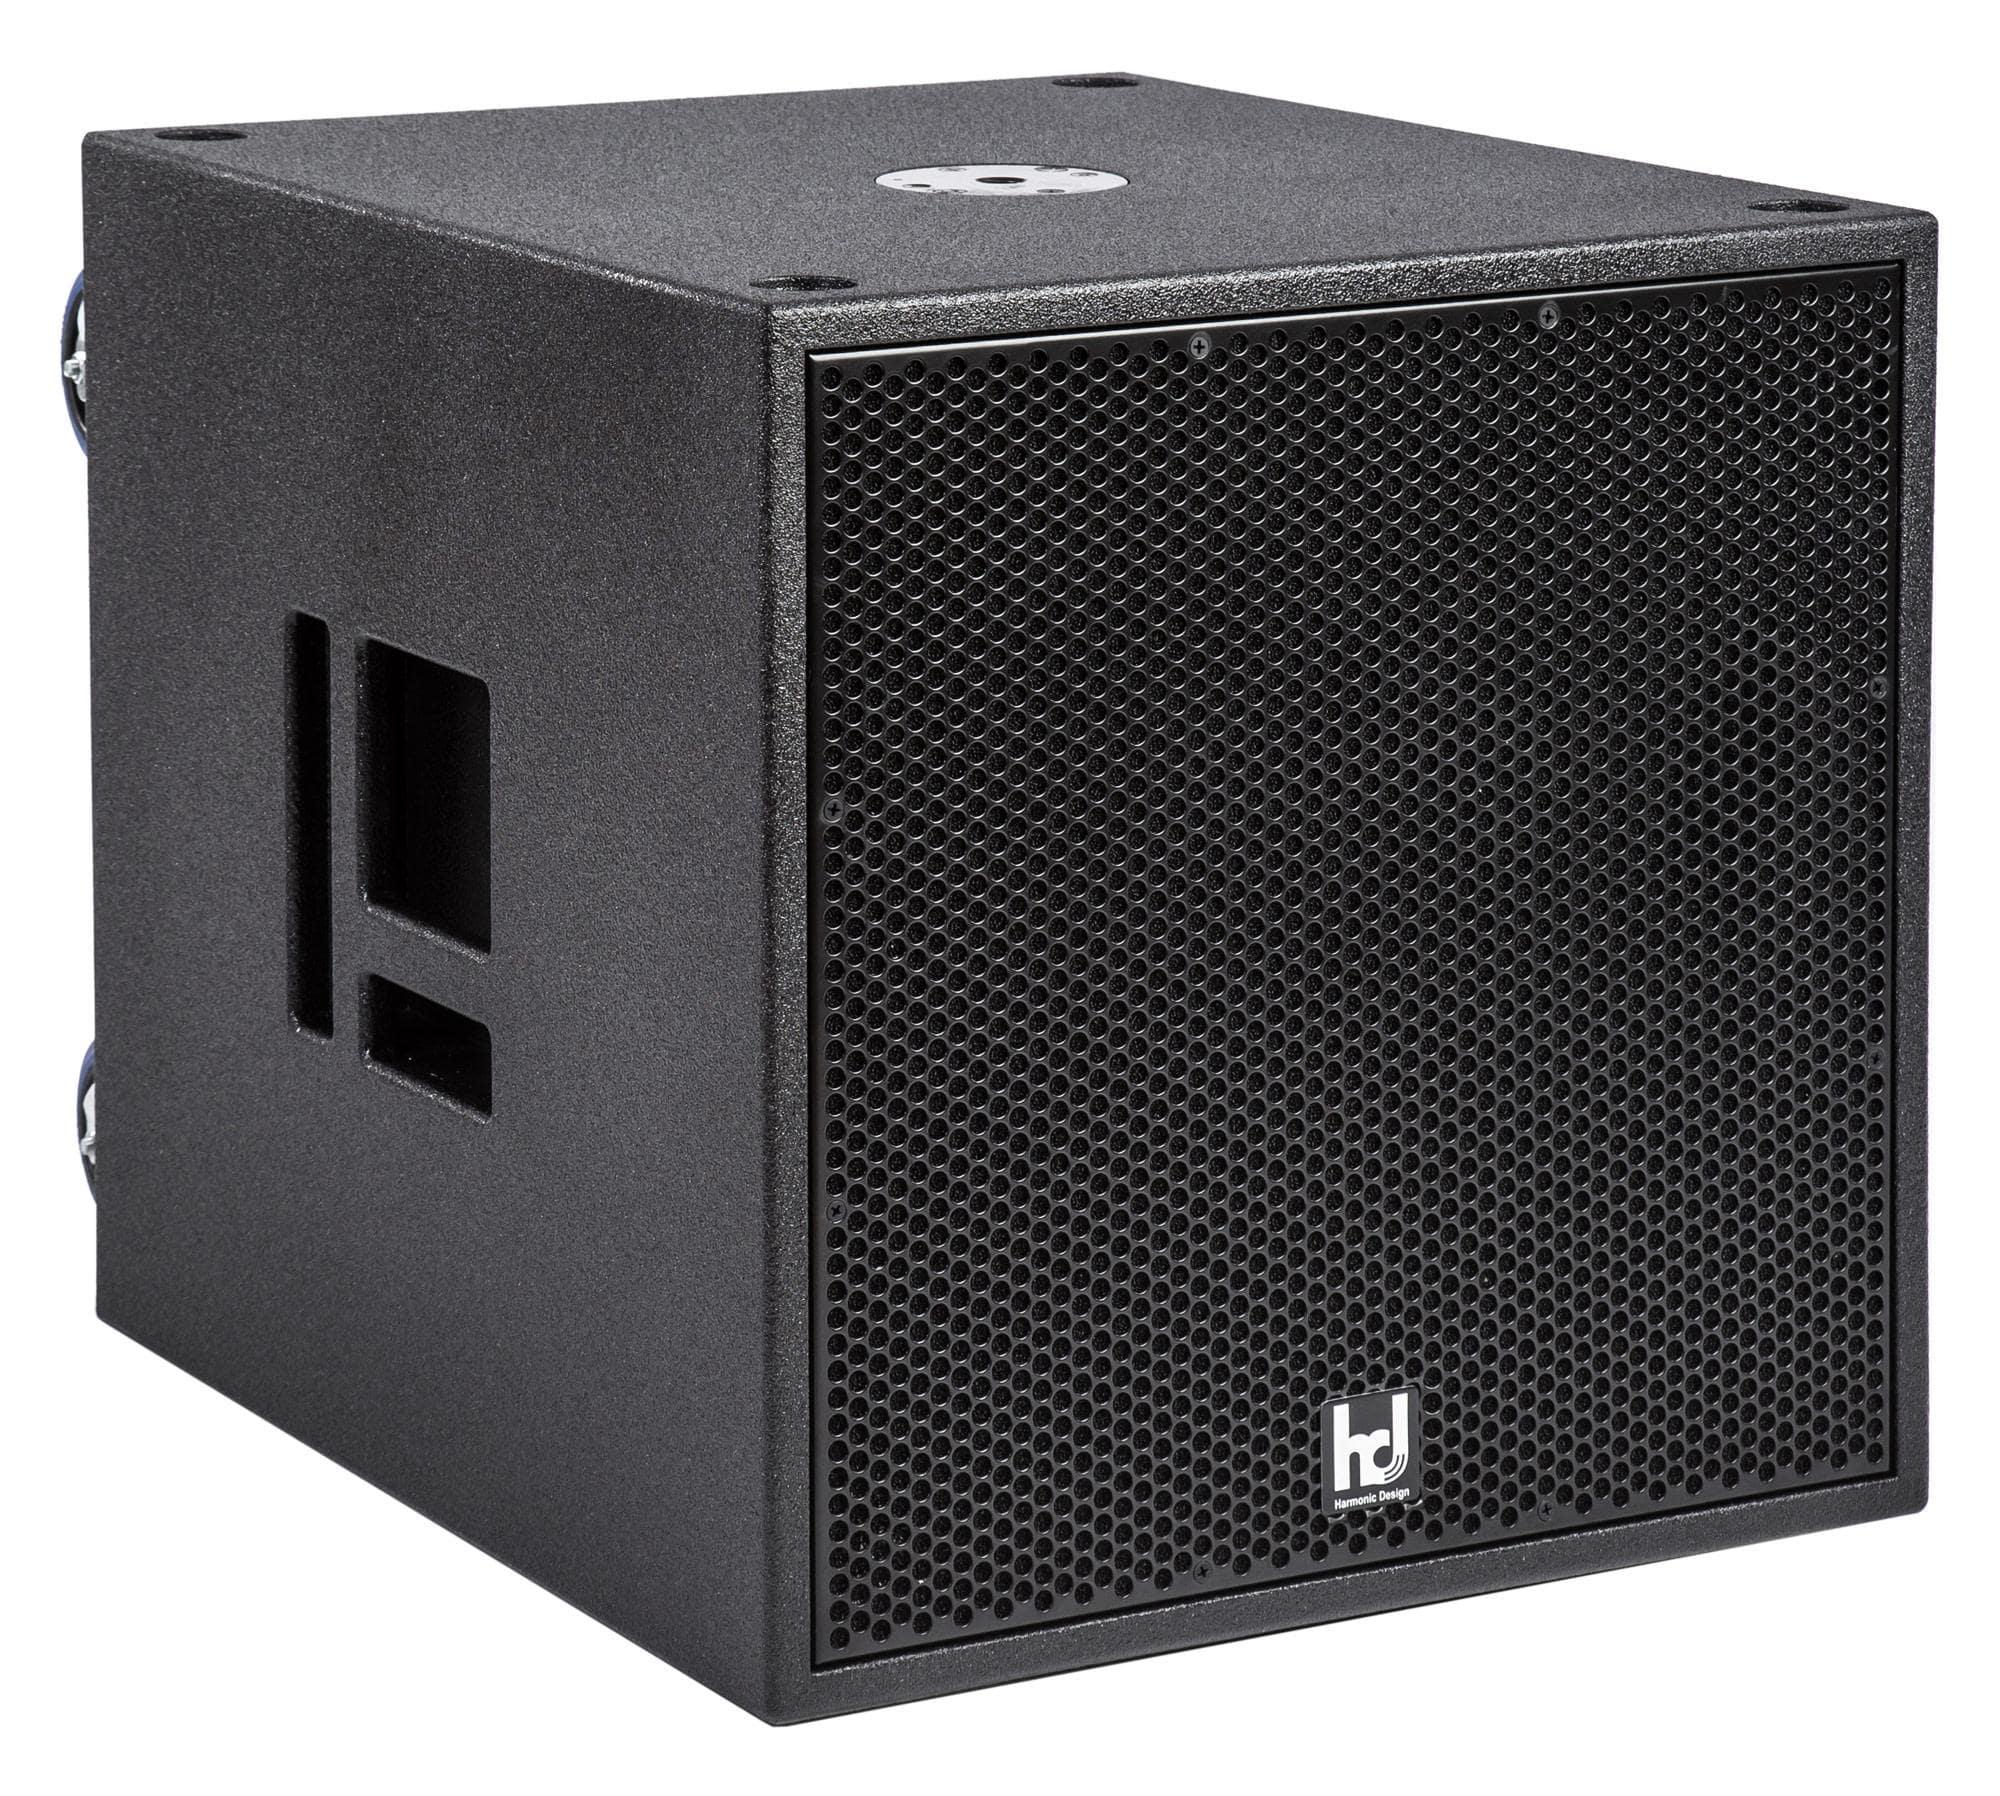 Harmonic Design P18 Multi DSP Aktiv Subwoofer, 4100 Watt Digitalcontroller, 1x 2500W 2x 800 W, mit Rollen Retoure (Zustand gut)